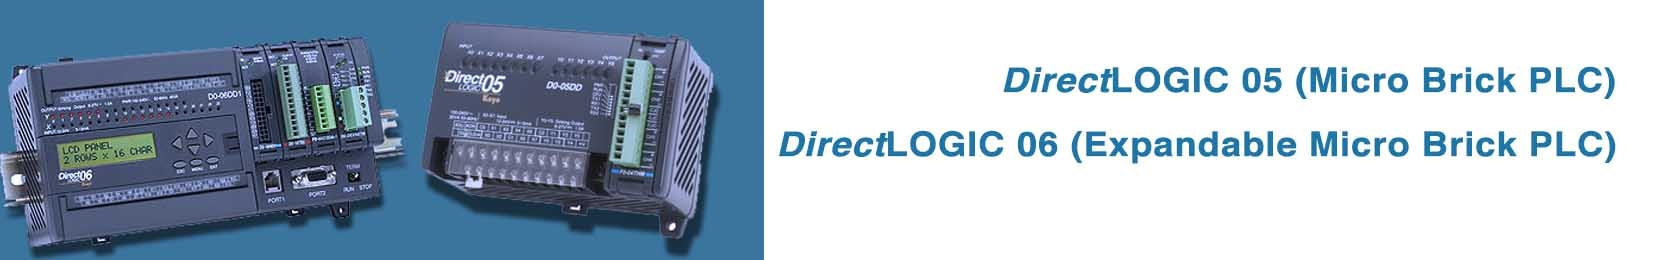 DL0506-banner